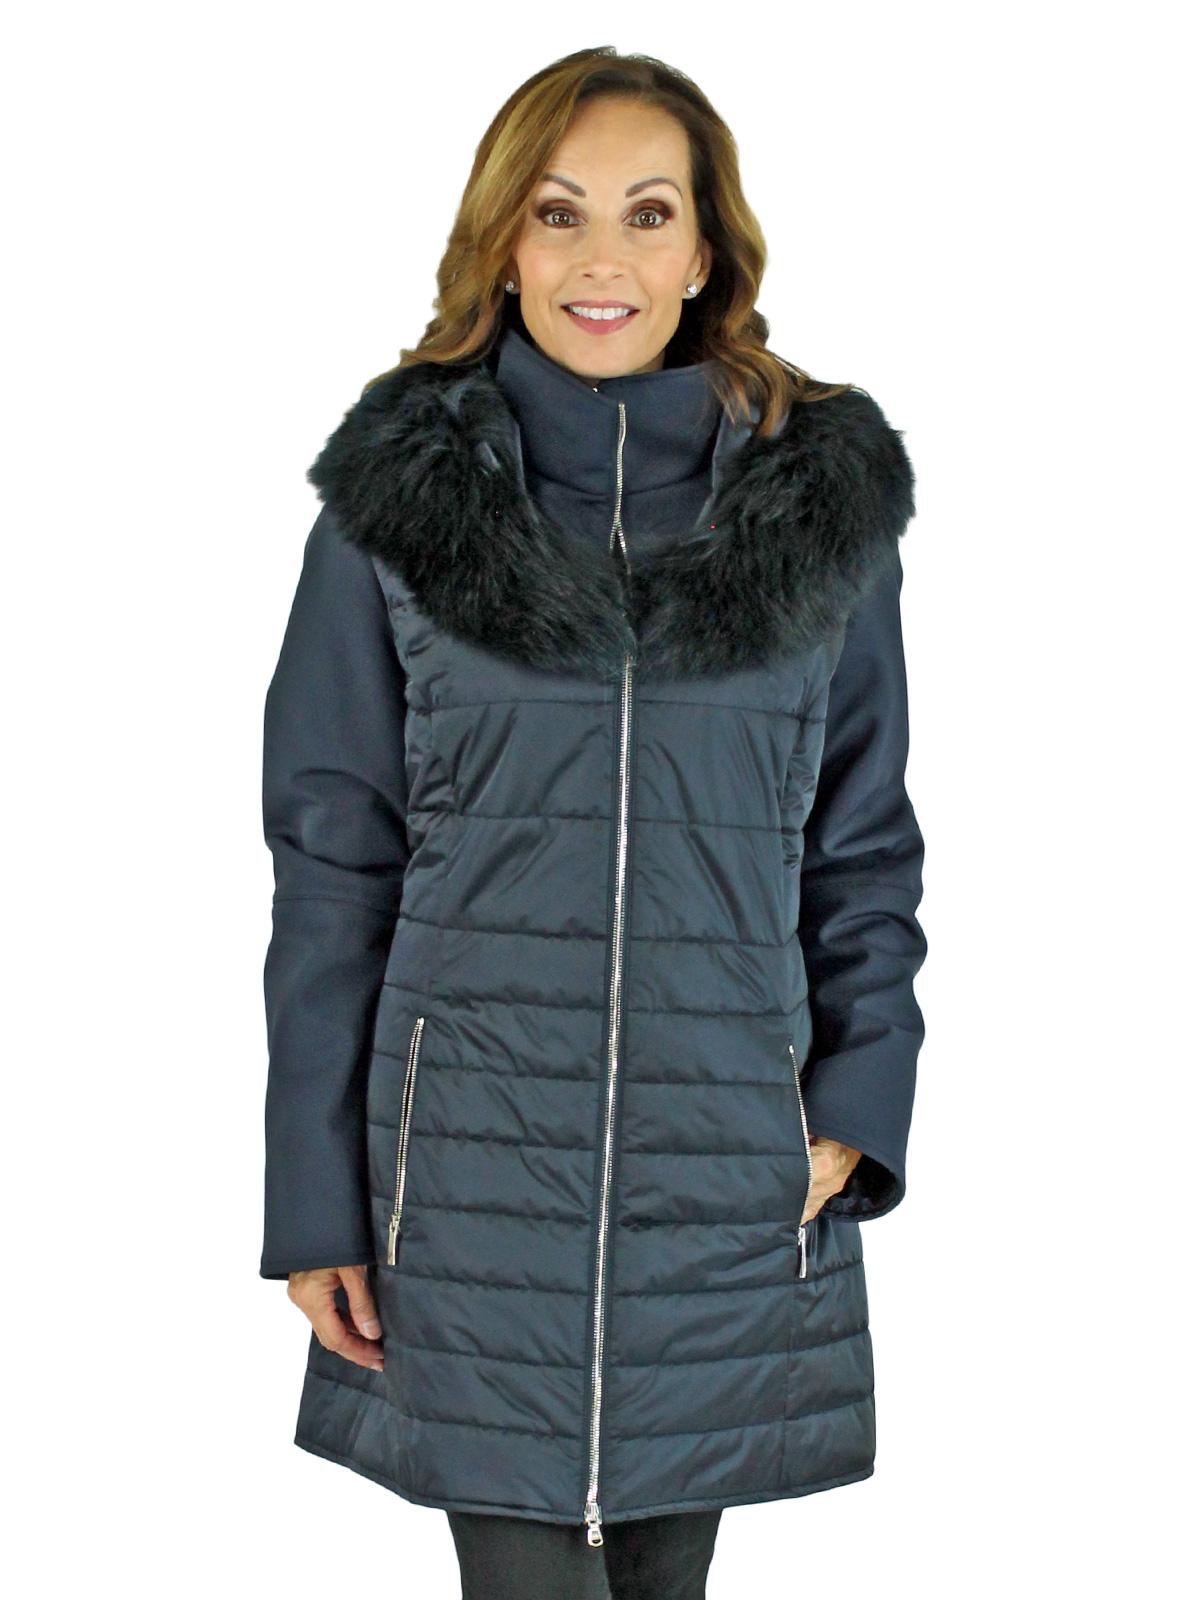 Woman's Navy Fabric Ski Parka with Finn Raccoon Fur Trim